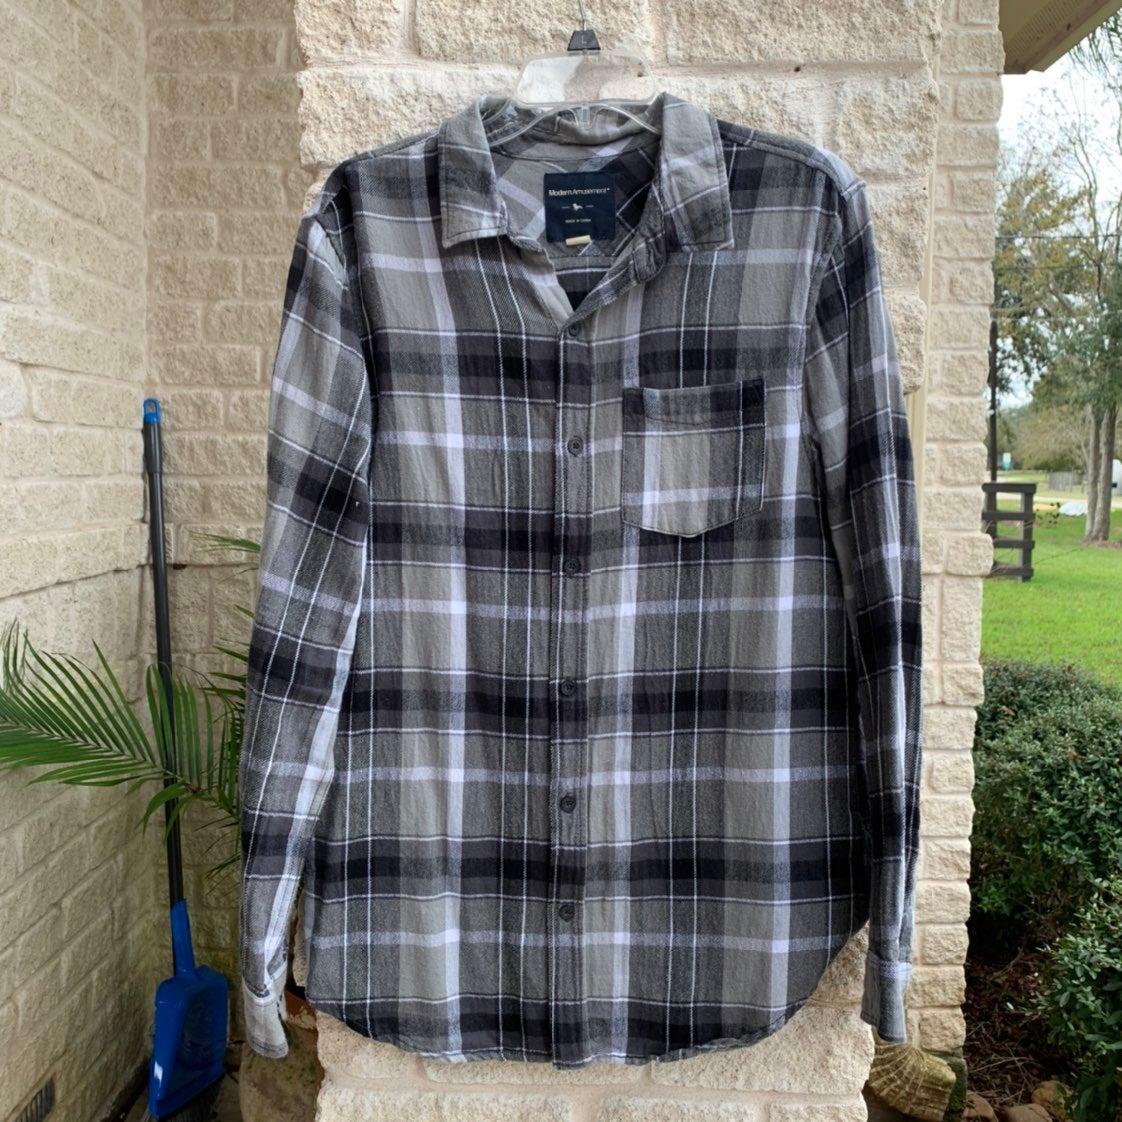 Pacsun Modern Amusement Grey Flannel